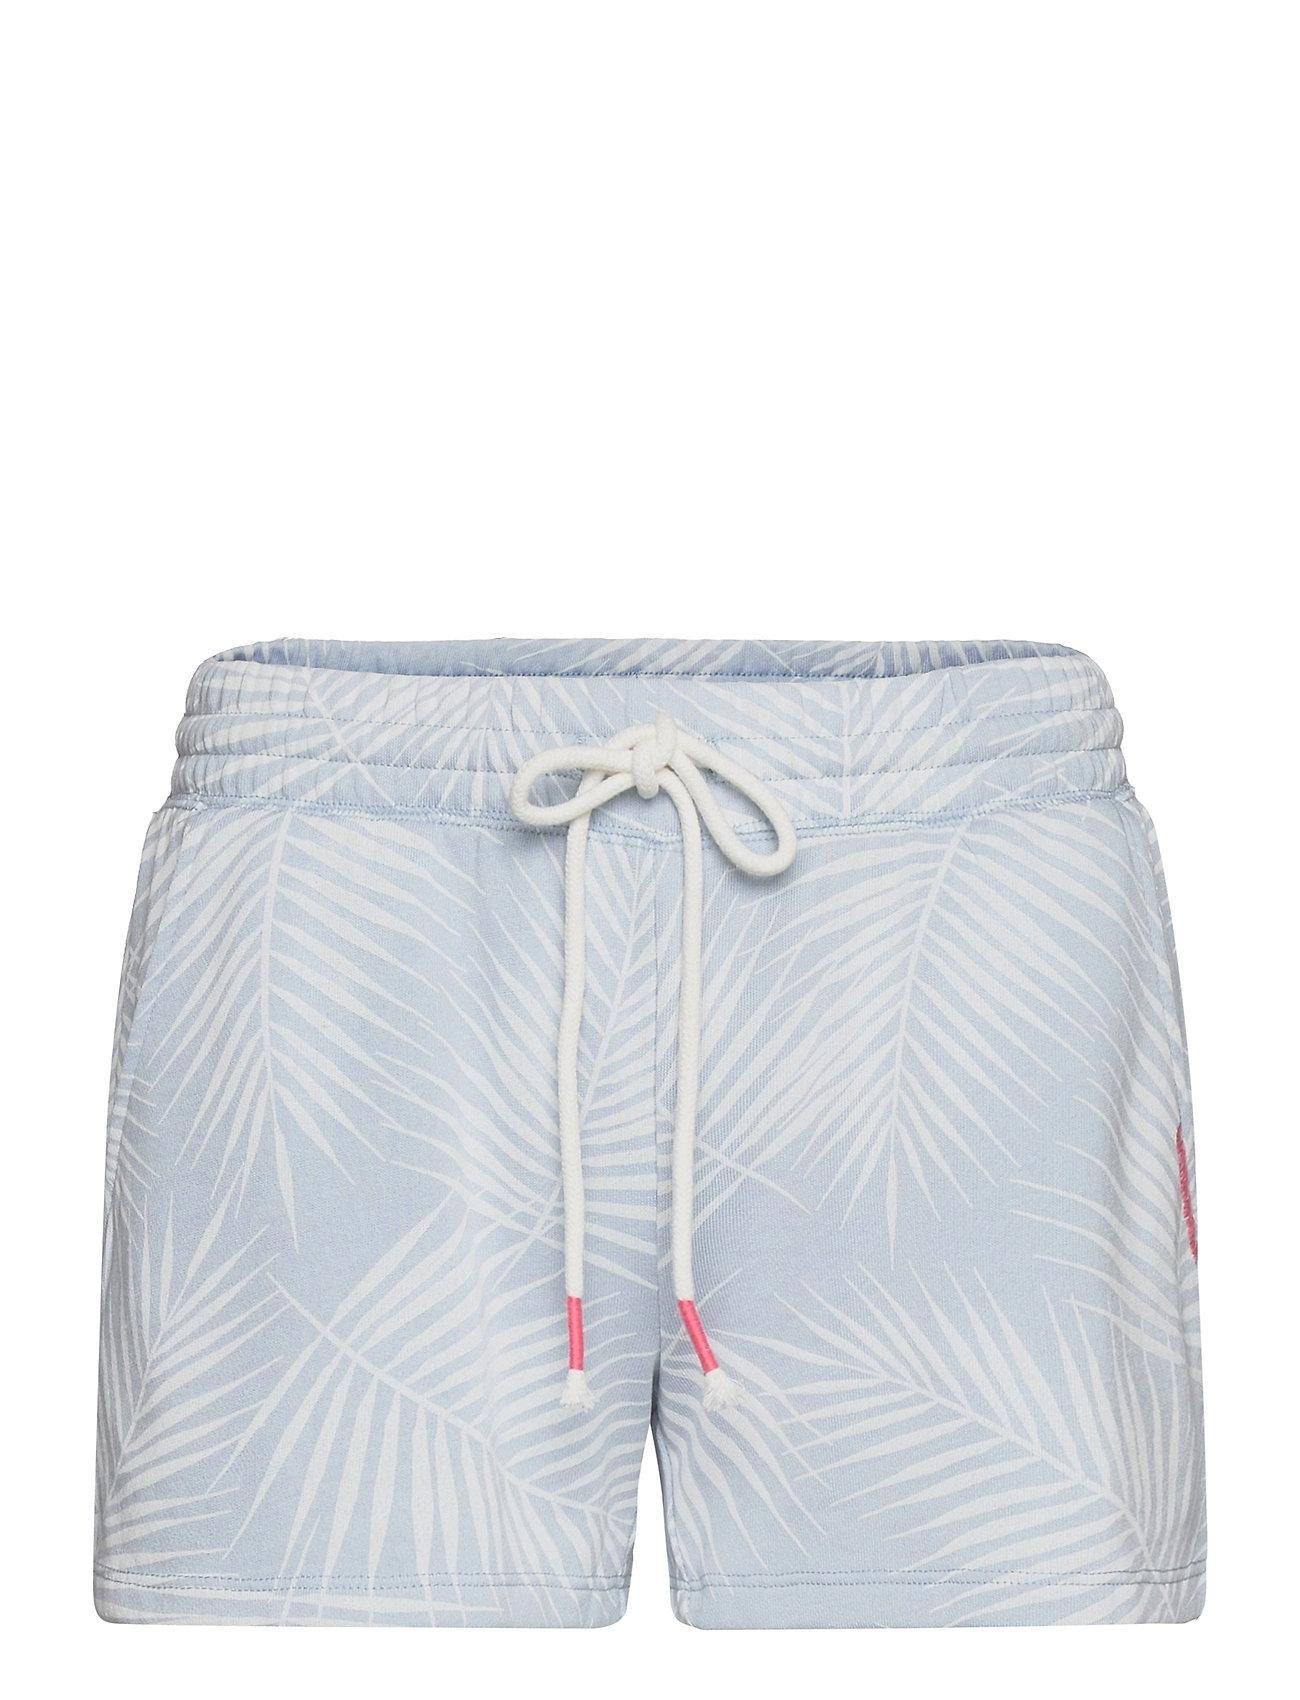 Short Shorts Blå PJ Salvage